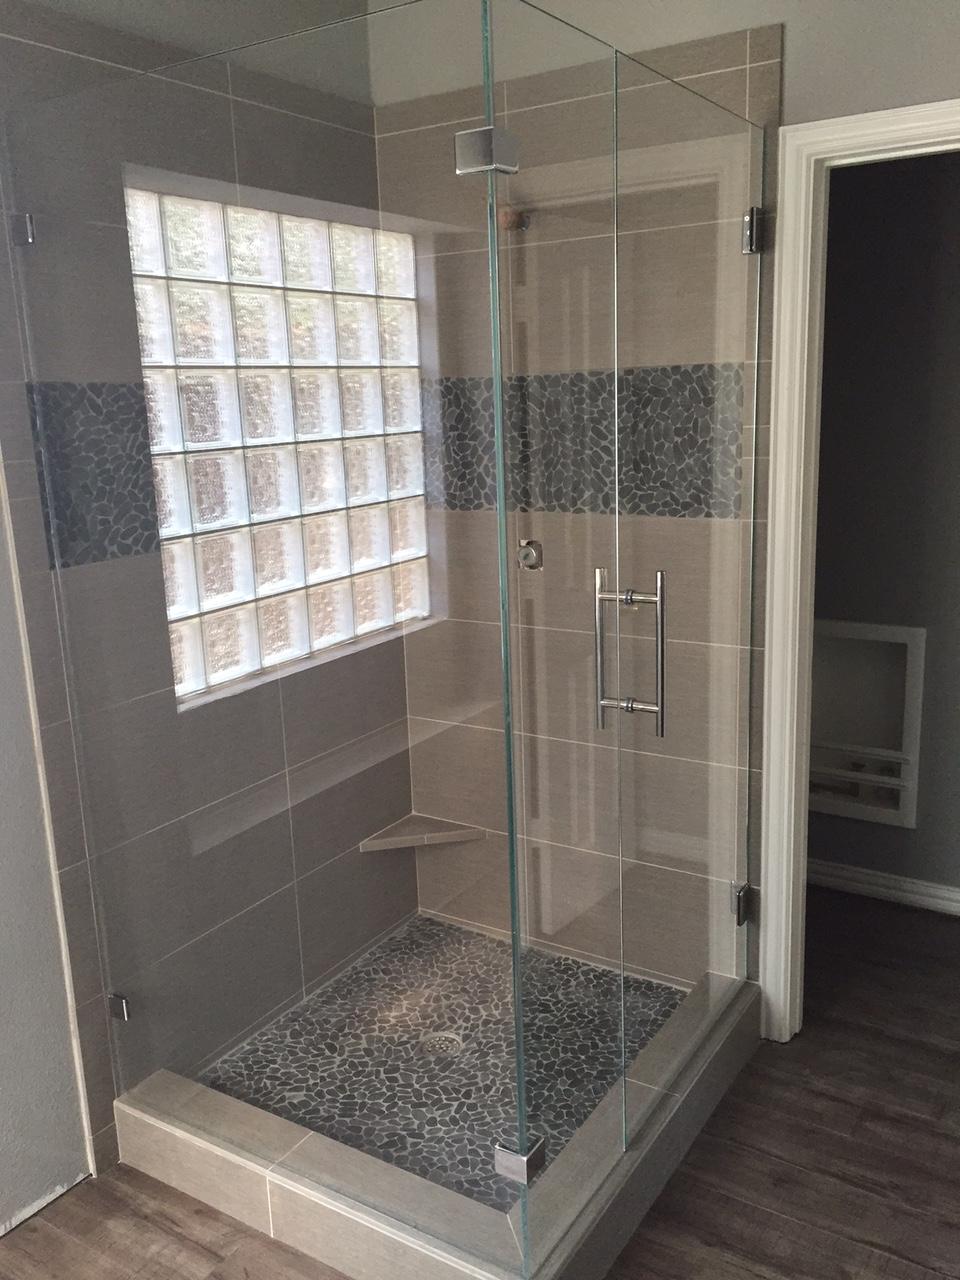 Star Fire Glass Shower - DFW Bath and Glass